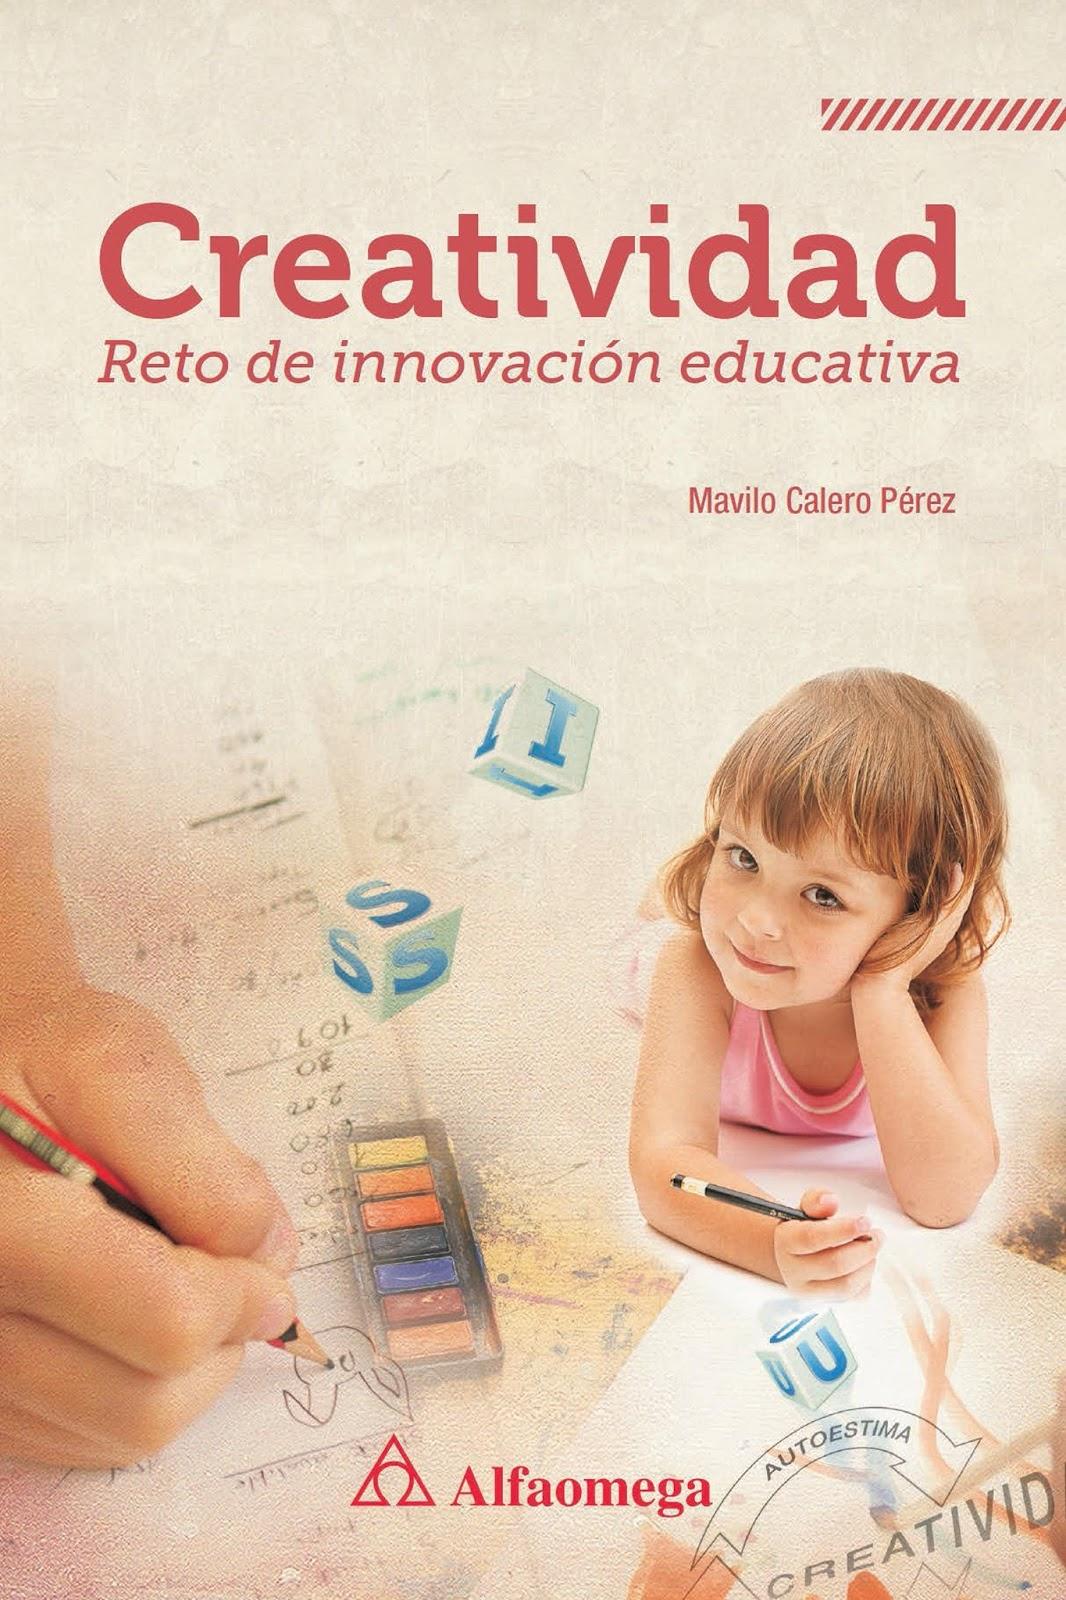 Creatividad: Reto de innovación educativa – Mavilo Calero Pérez